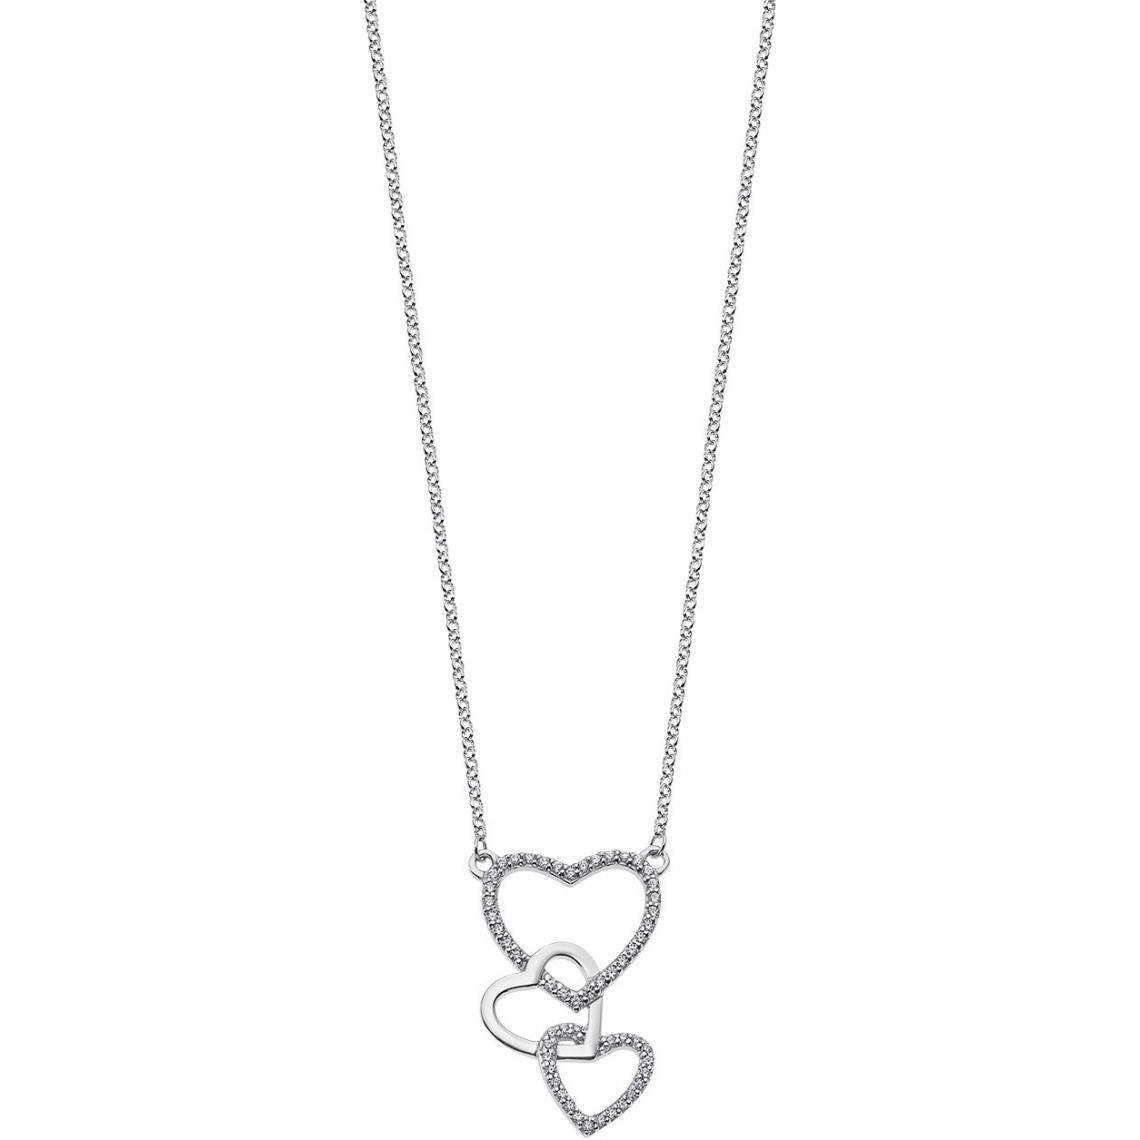 Promo : Collier et pendentif Lotus Silver MOMENTS LP1817-1-1 - Collier et pendentif MOMENTS Argent Coeur Lotus Silver